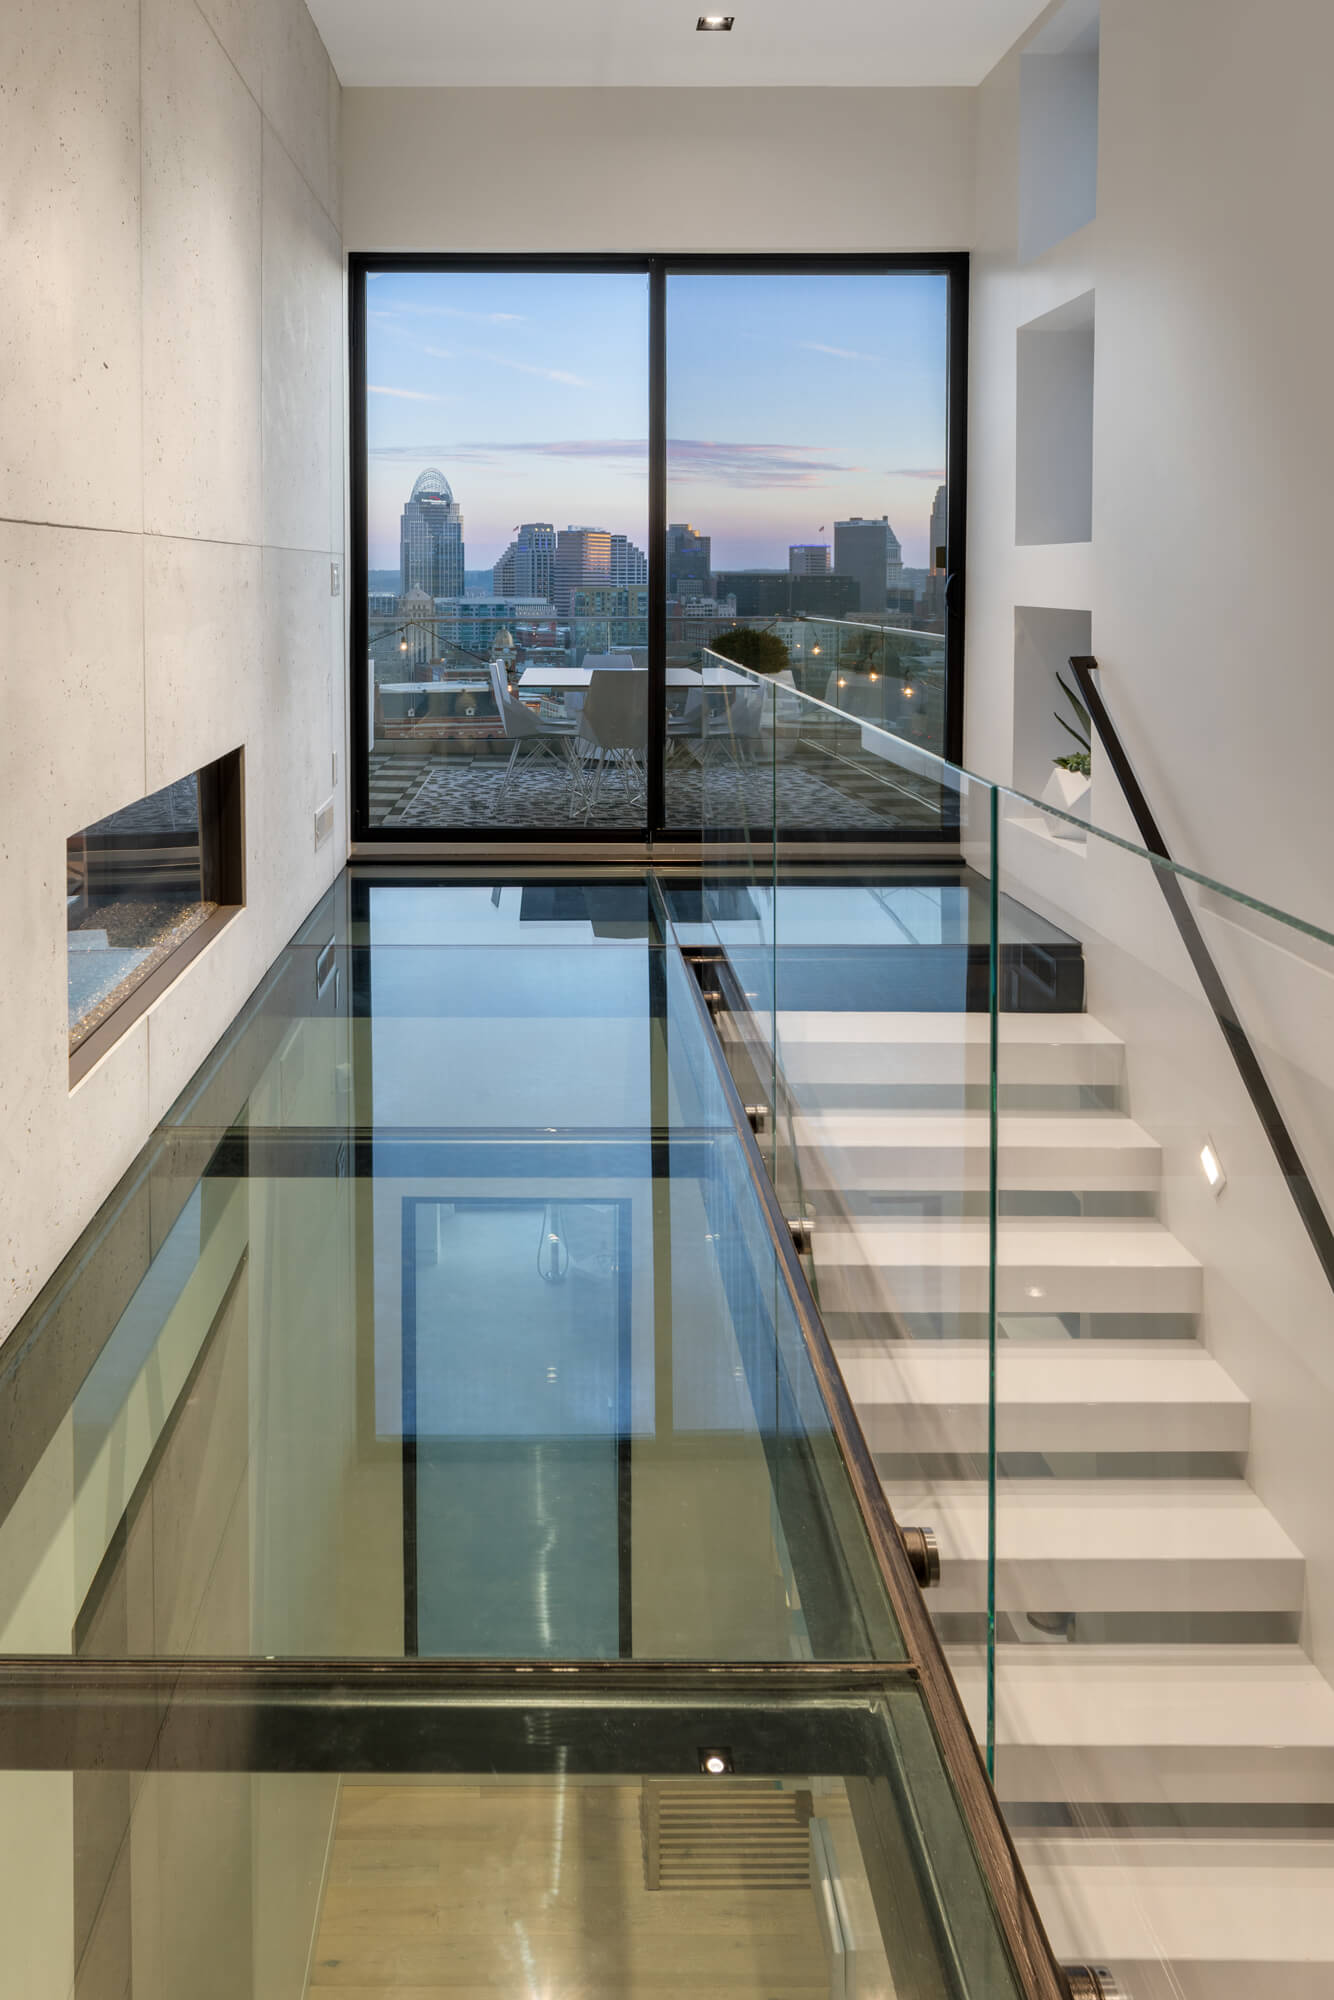 Custom Starway and glass floor hallway with Cincinnati Skyline views by Premiere Interior Designer, RM Interiors